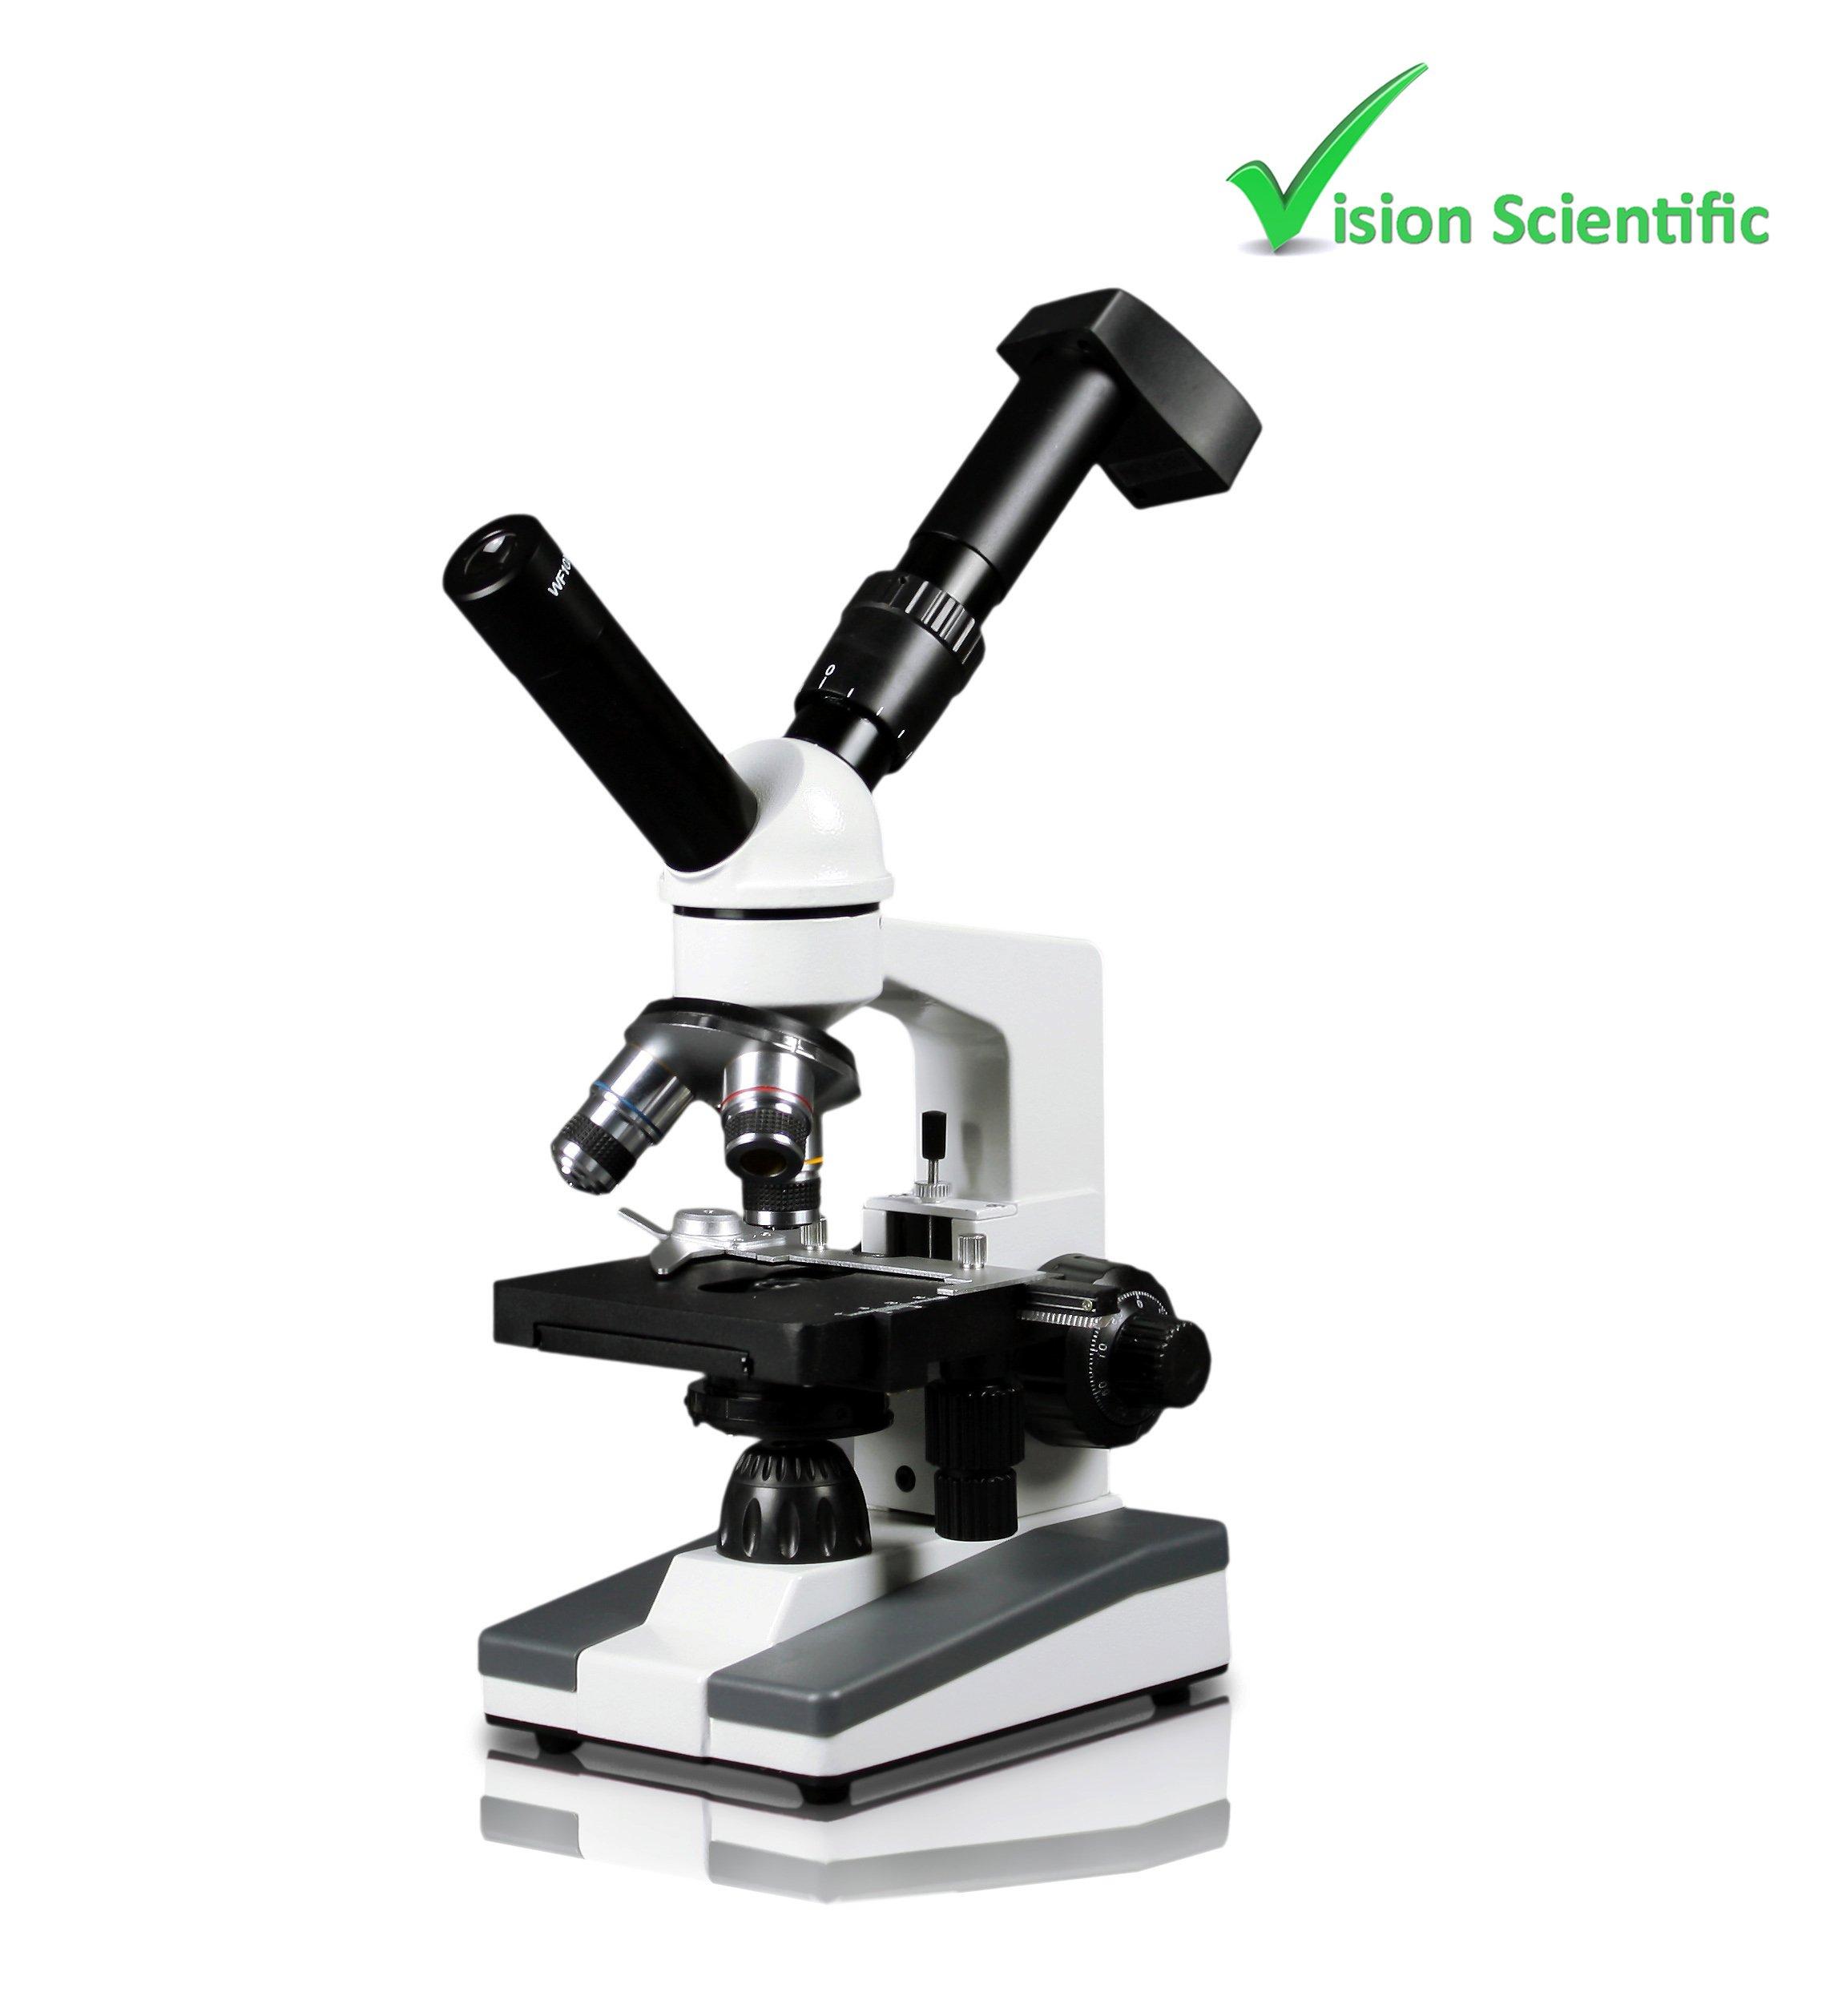 Vision Scientific VME0019-ST-LD-DG0.3 Dual View Elementary Level Compound Microscope, 10x WF & 25x WF Eyepiece, 40x-1000x Magnification, LED Illumination, 0.35MP Digital Eyepiece Camera